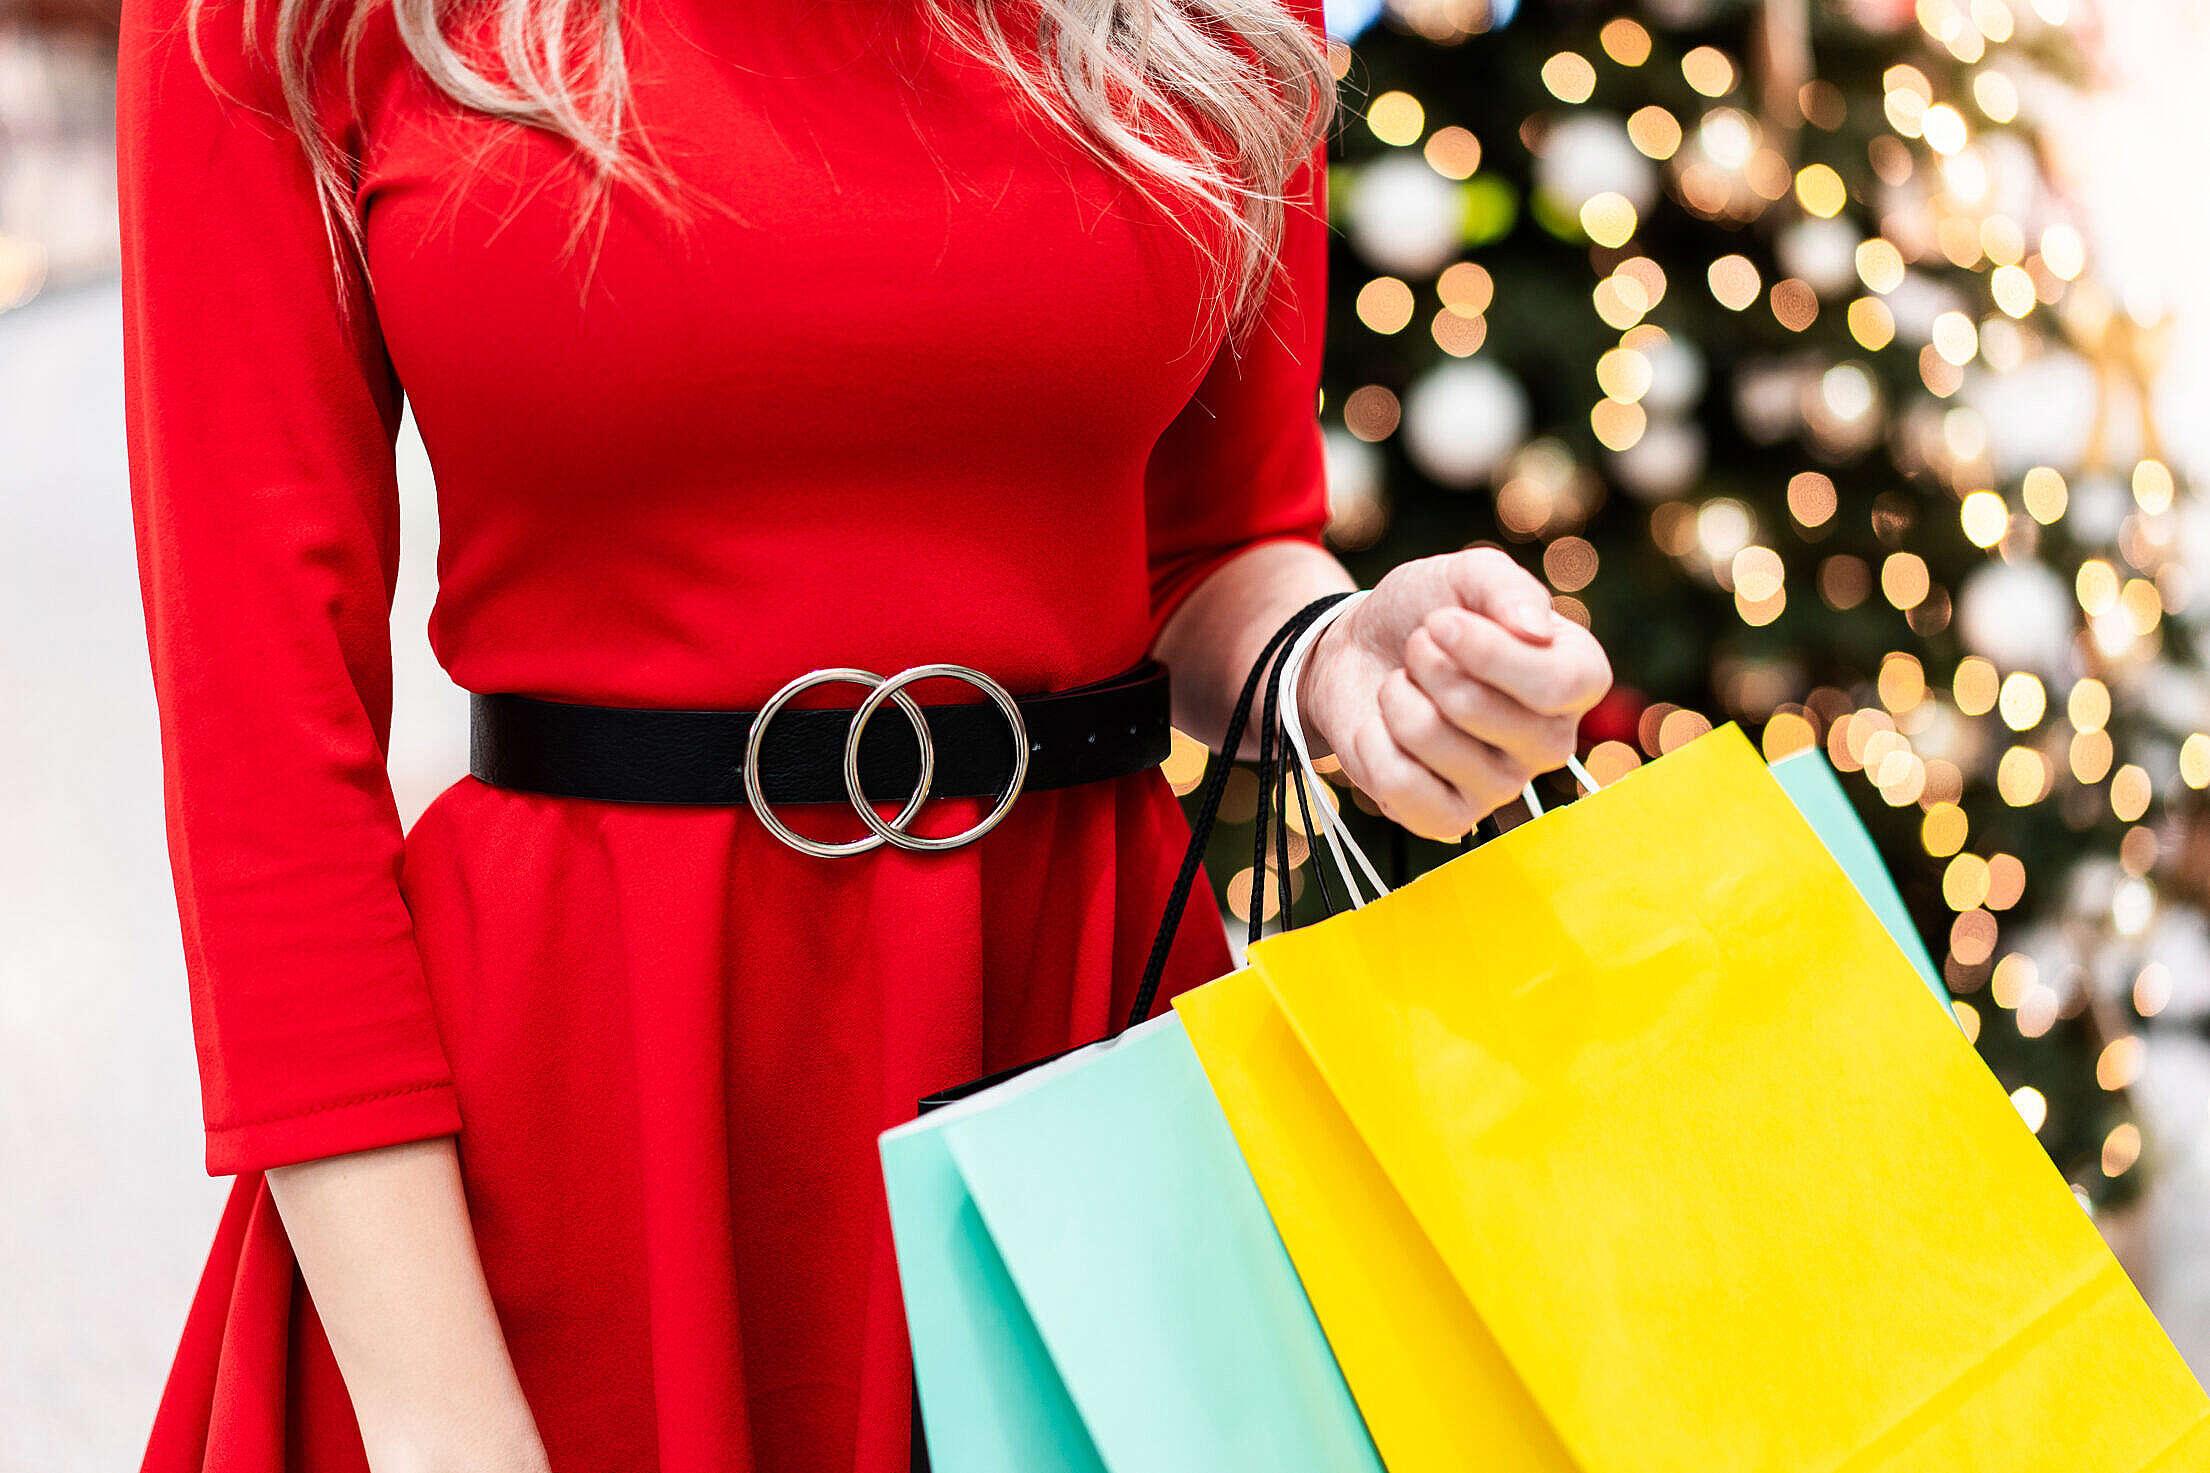 Woman Shopping Christmas Gifts Free Stock Photo